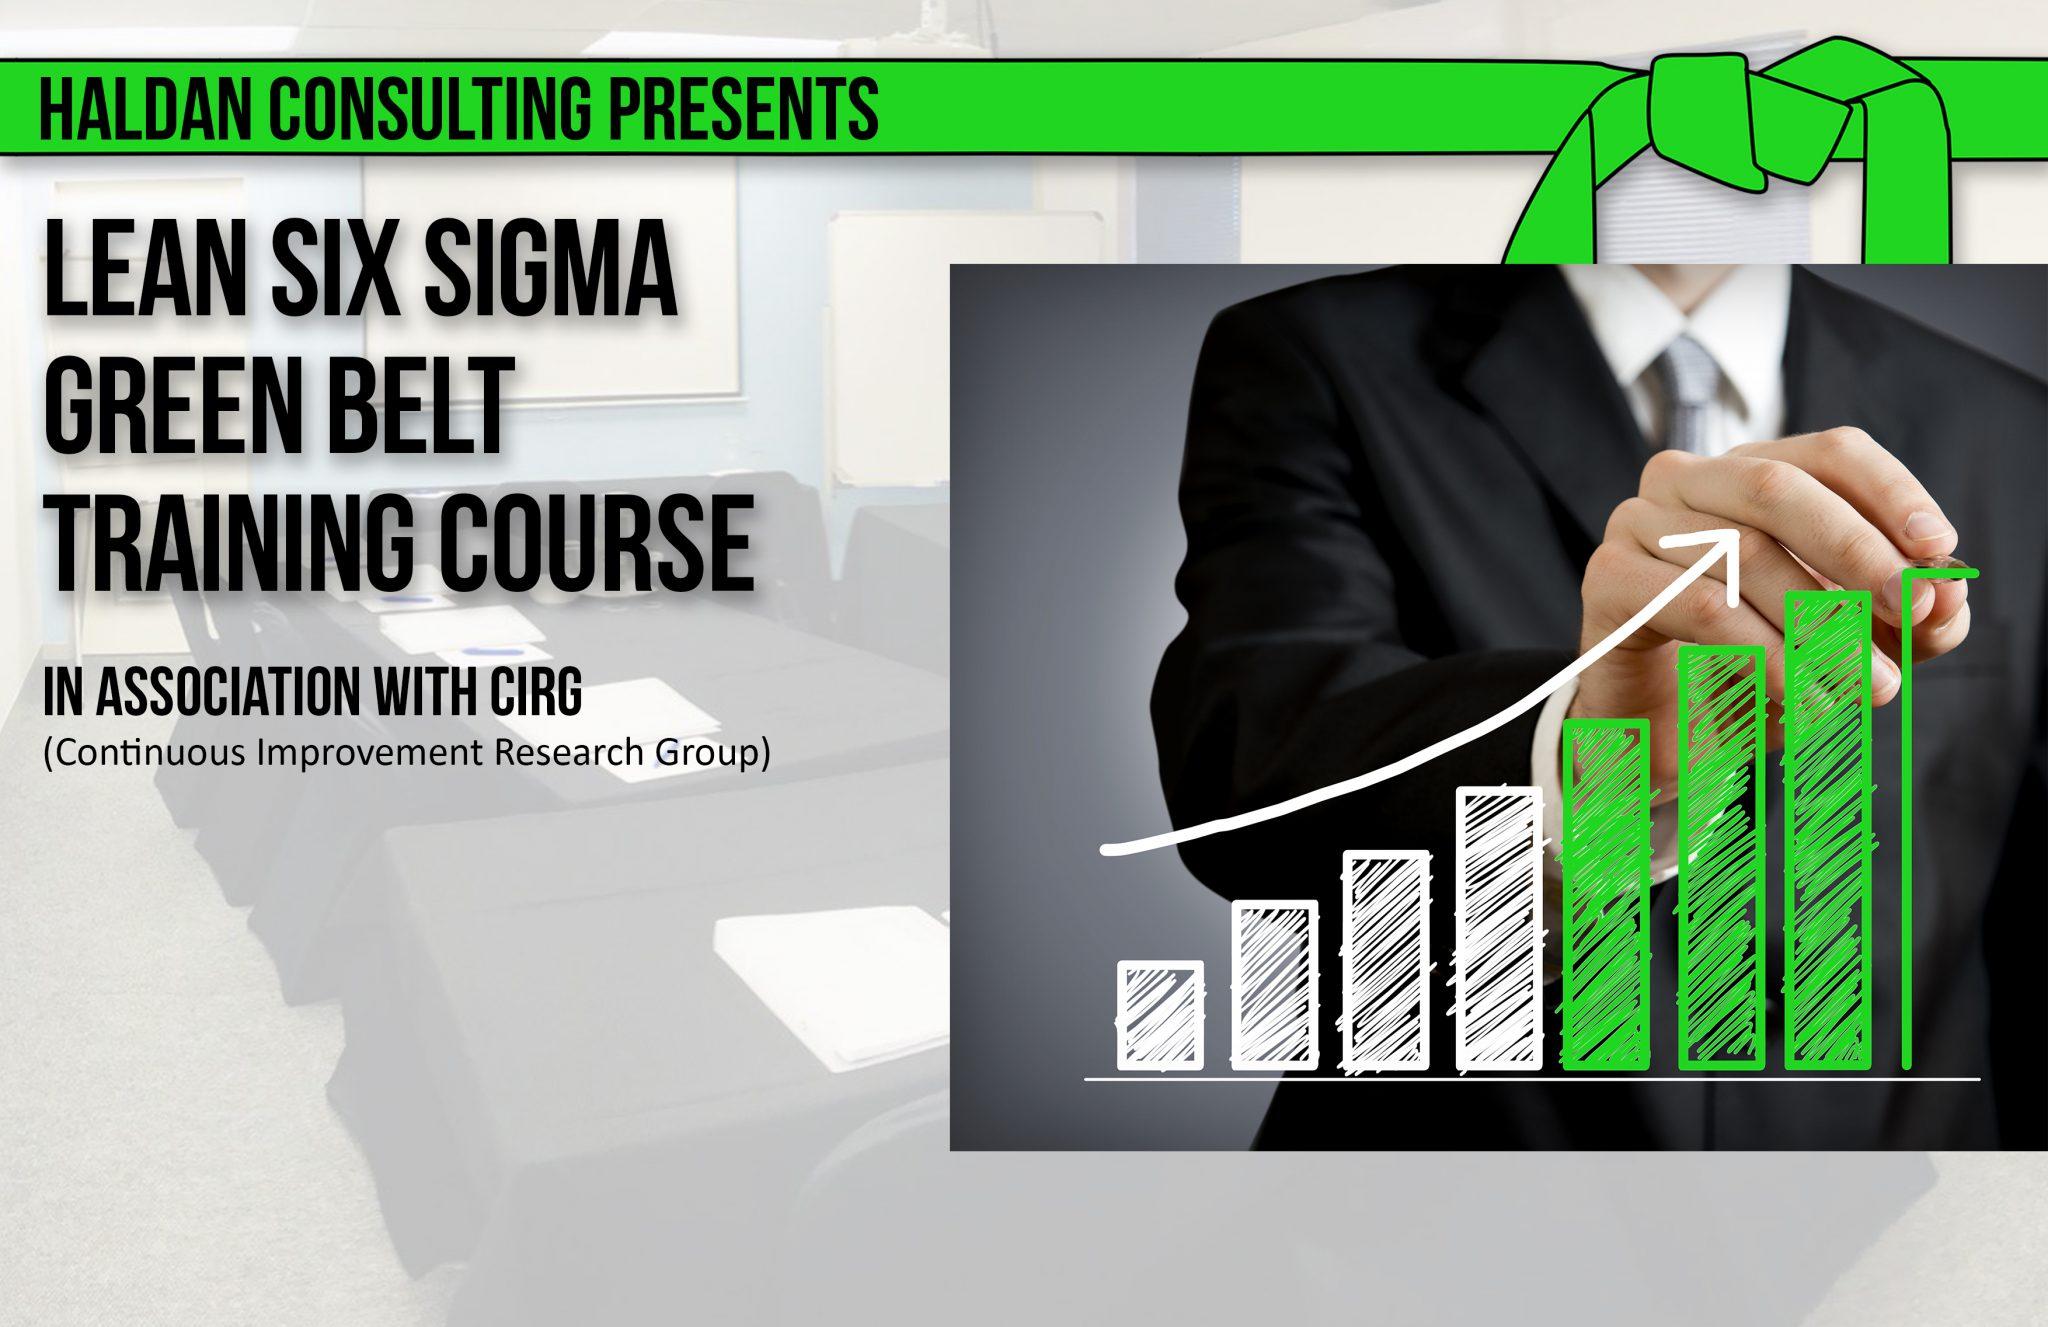 Haldan Consulting Lean Six Sigma Green Belt Training